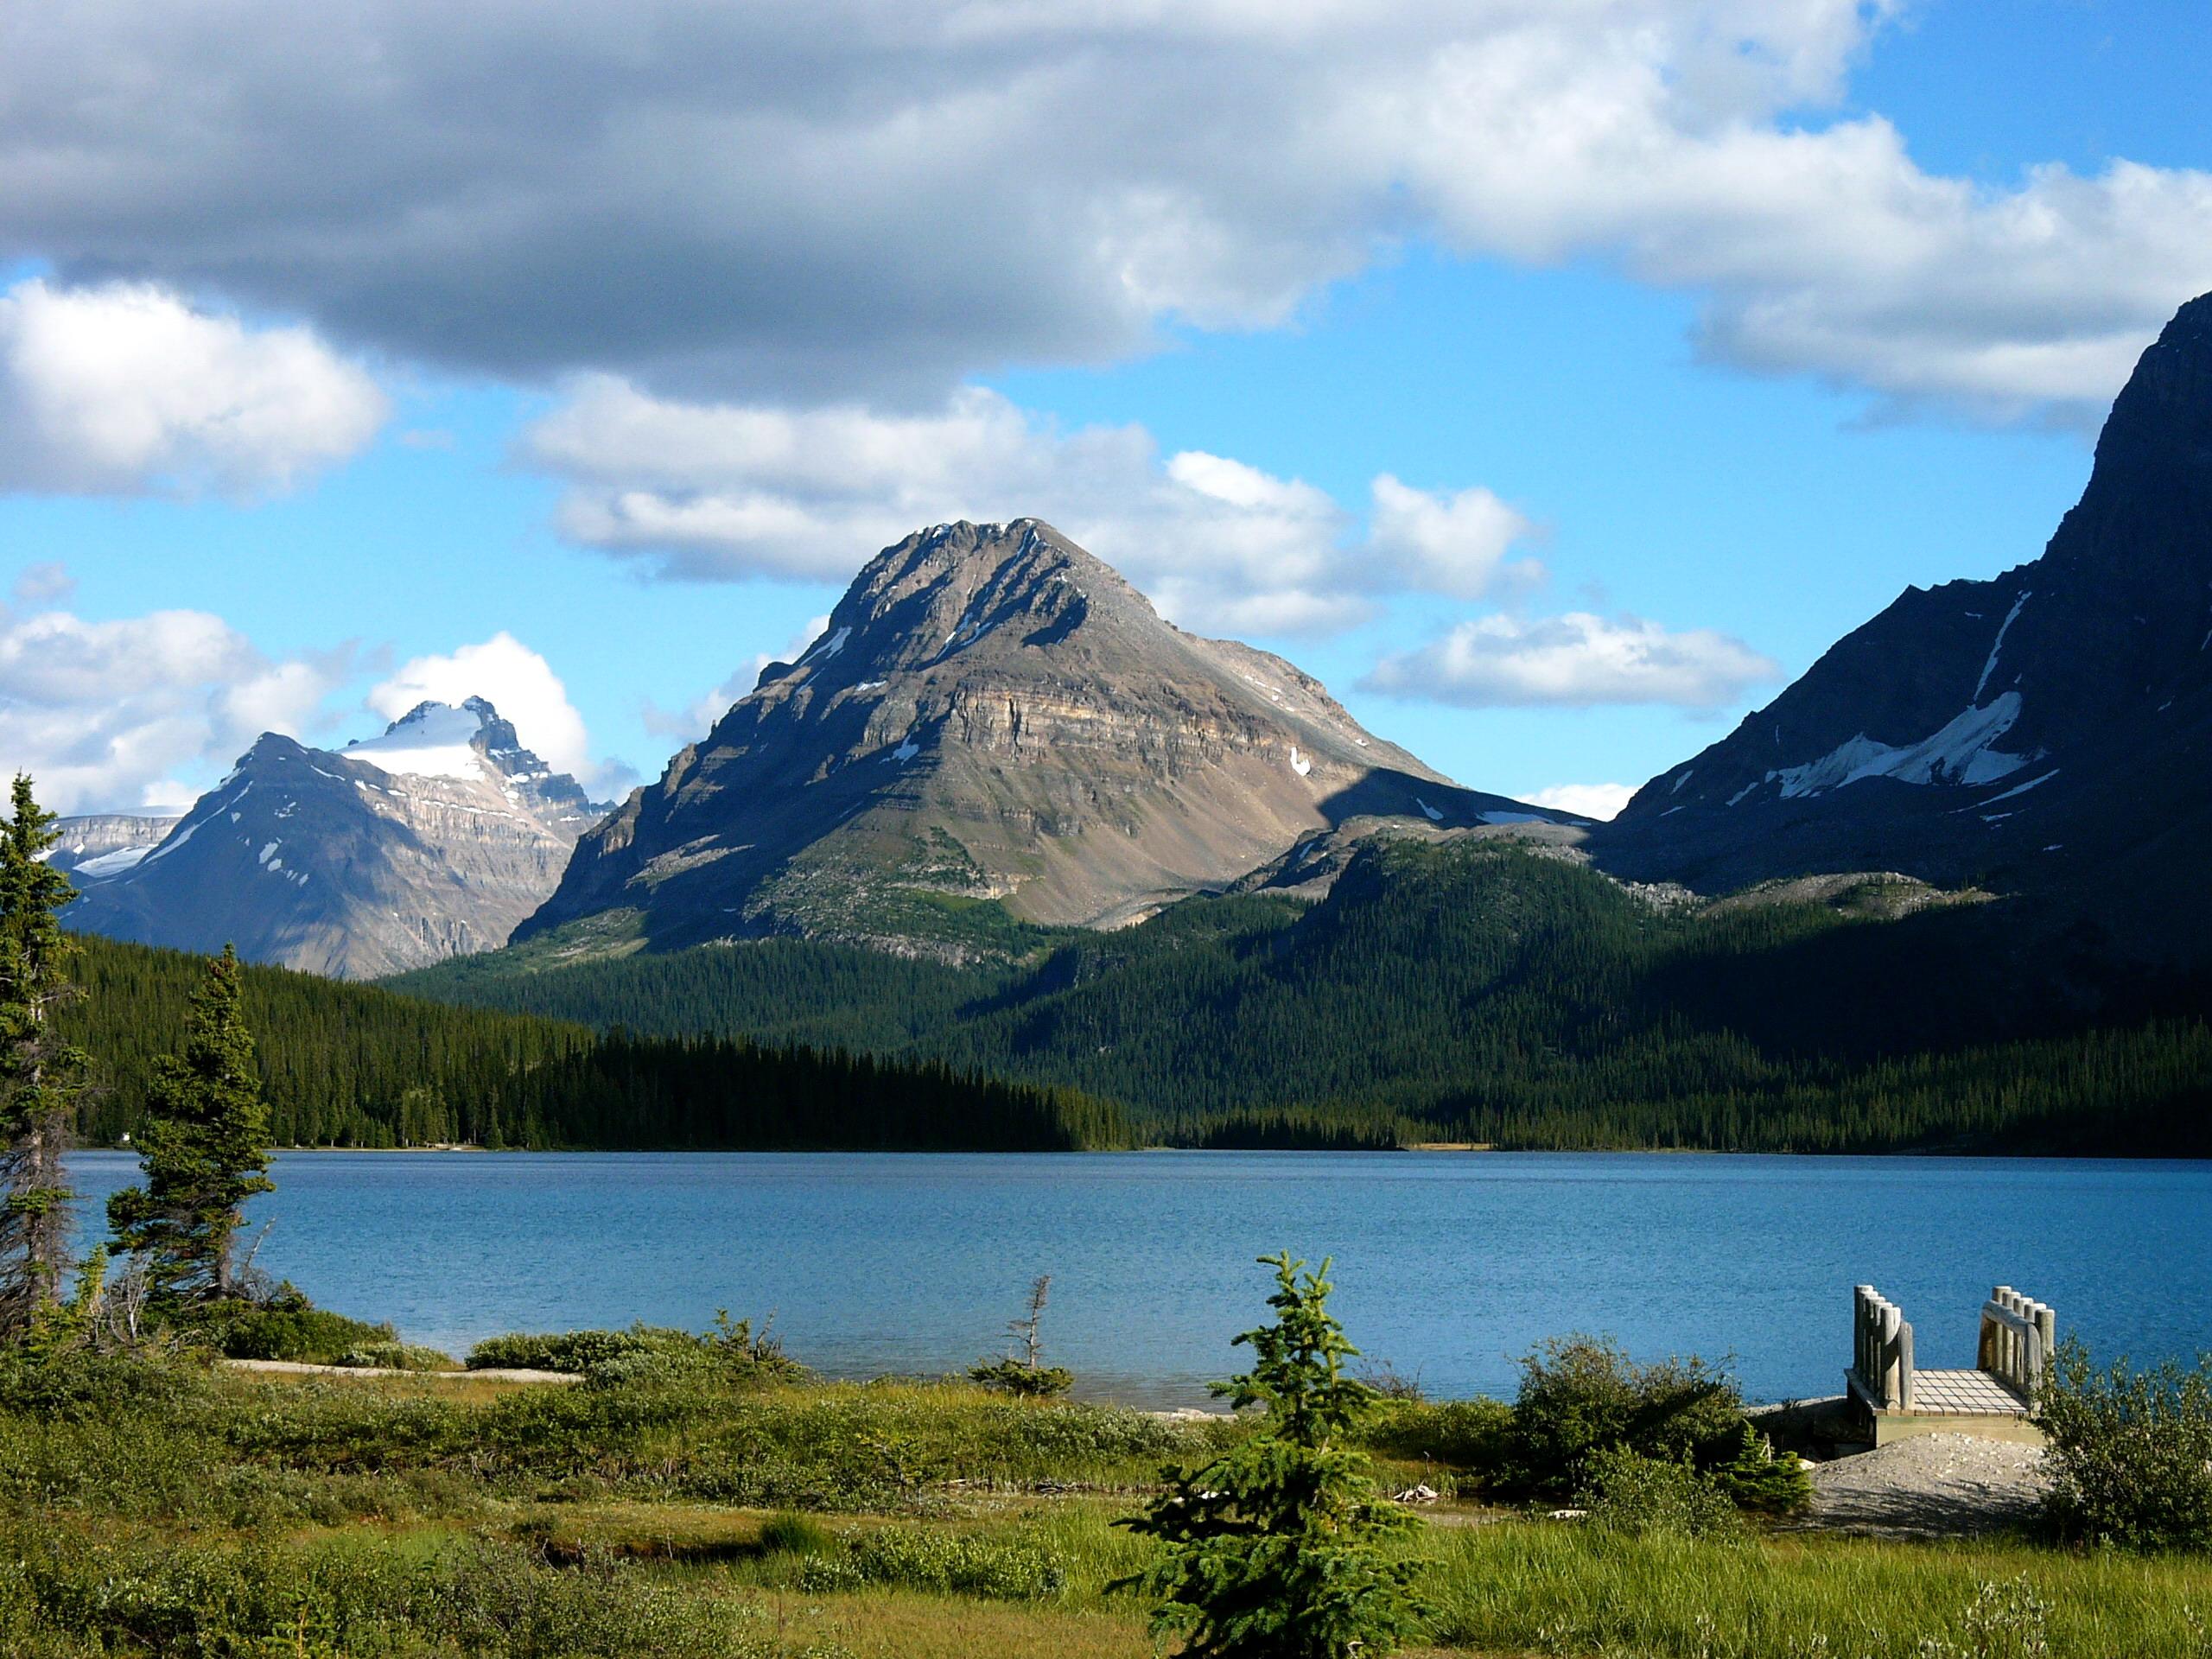 echanger sa maison au canada - Photo De Maison Au Canada